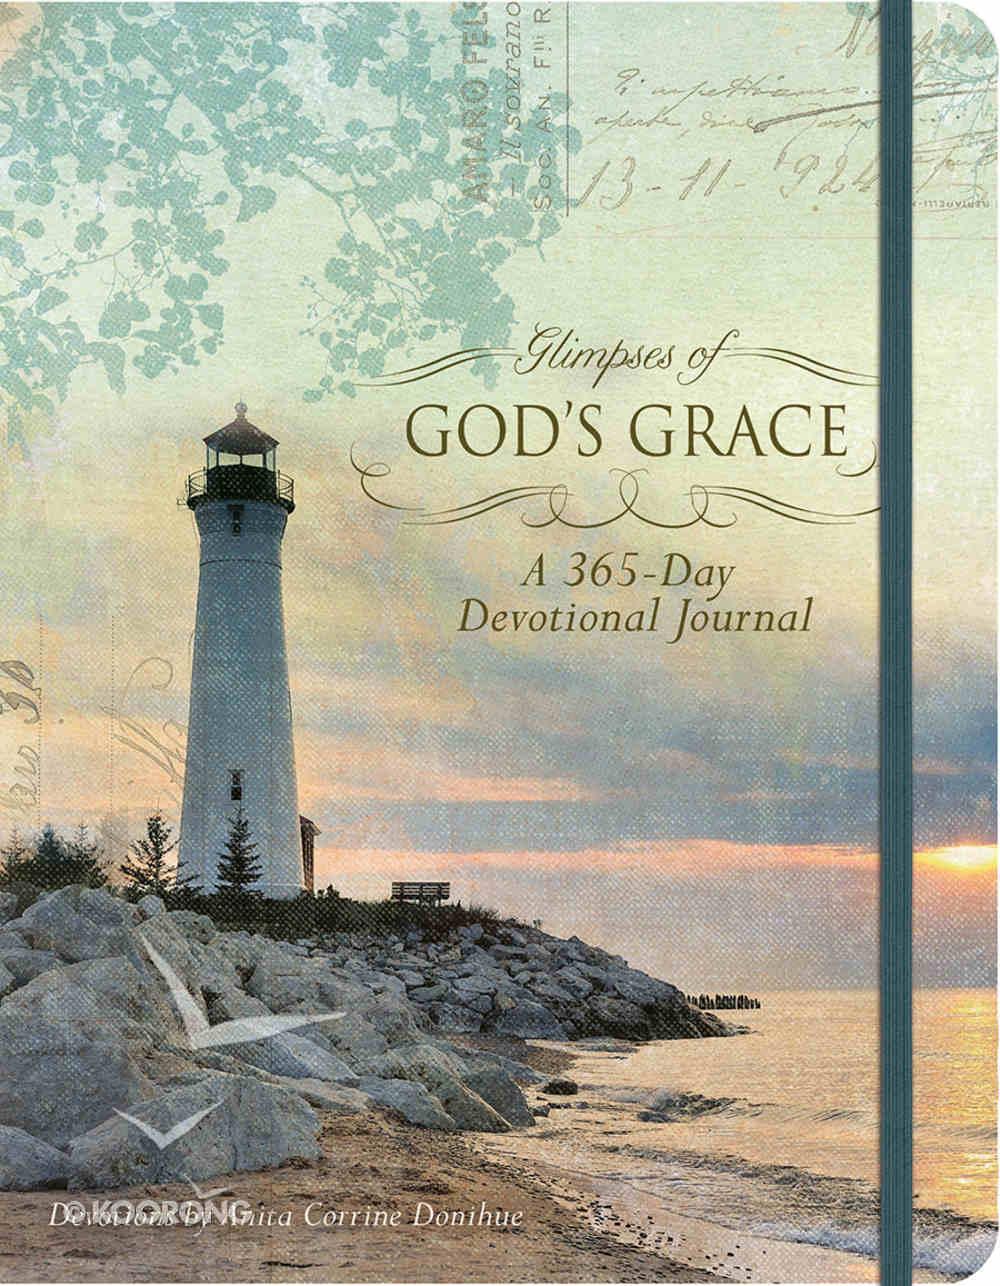 Devotional Journal: Glimpses of God's Grace Hardback